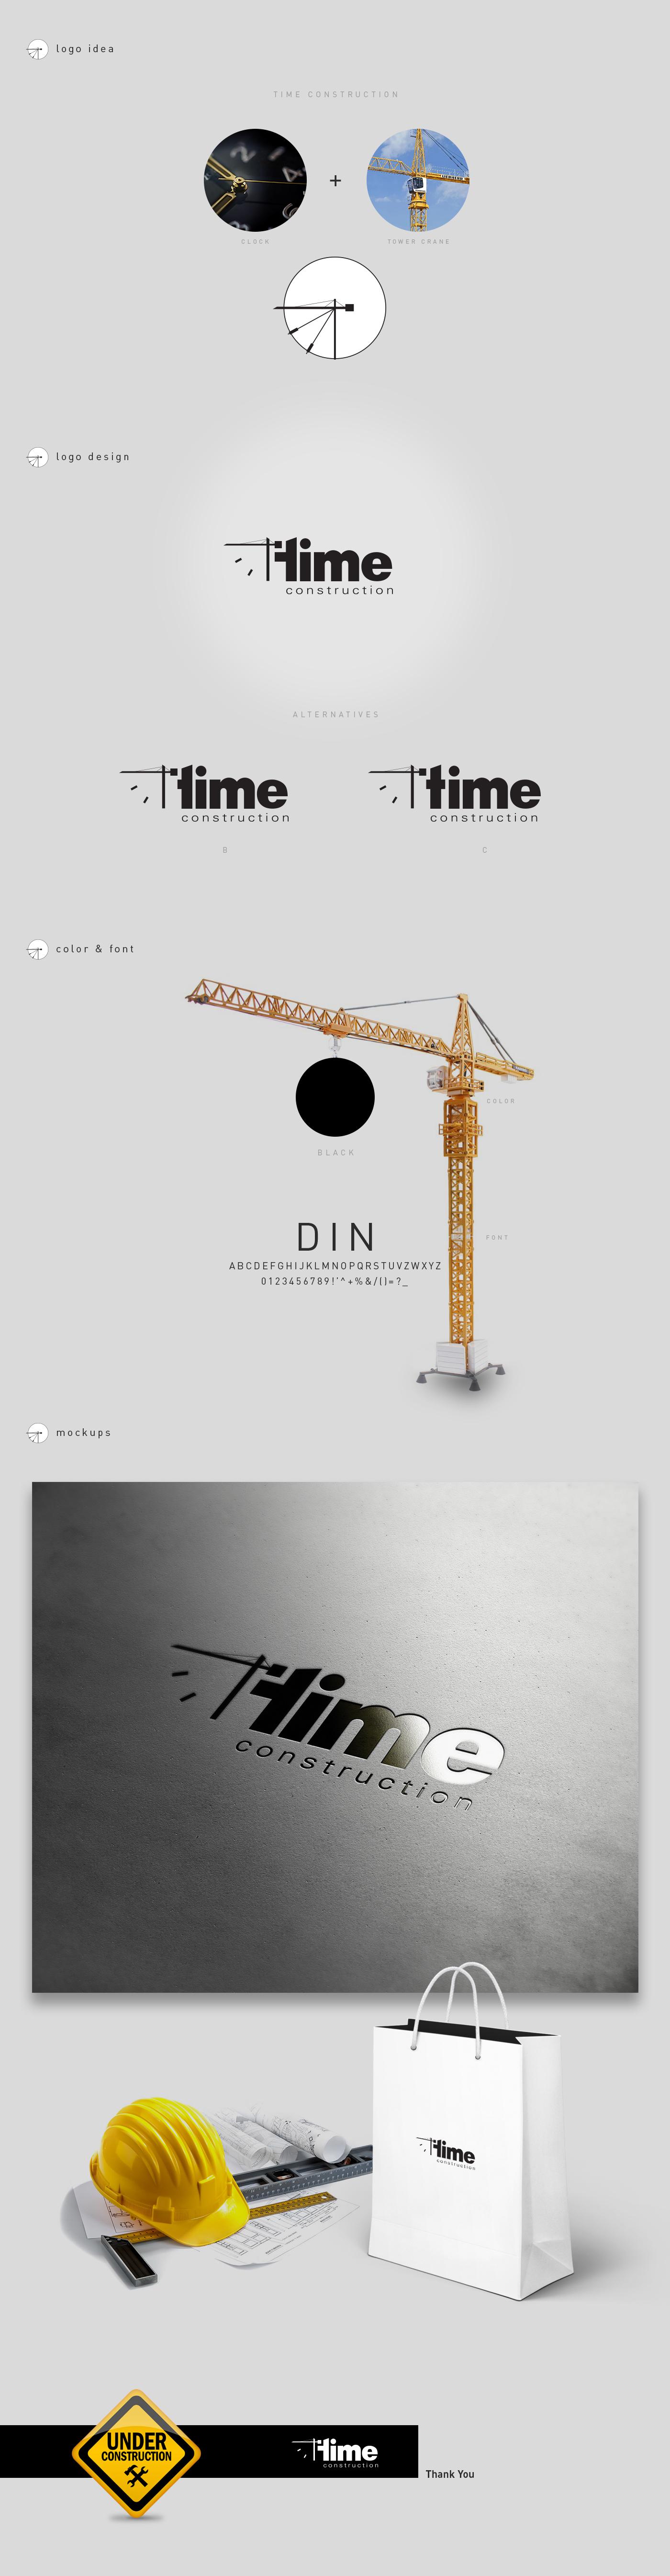 logo design construction crane lift construction company Corporate Identity branding